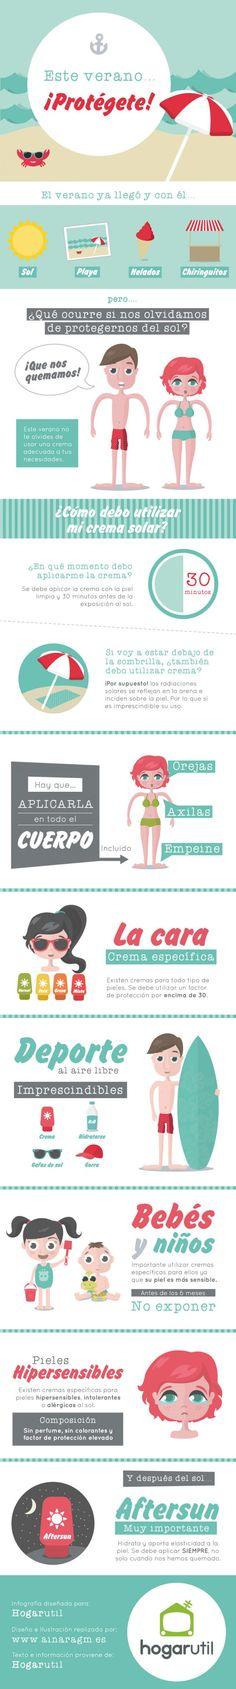 Infografía cremas sol verano #infografia #cremasolar #verano